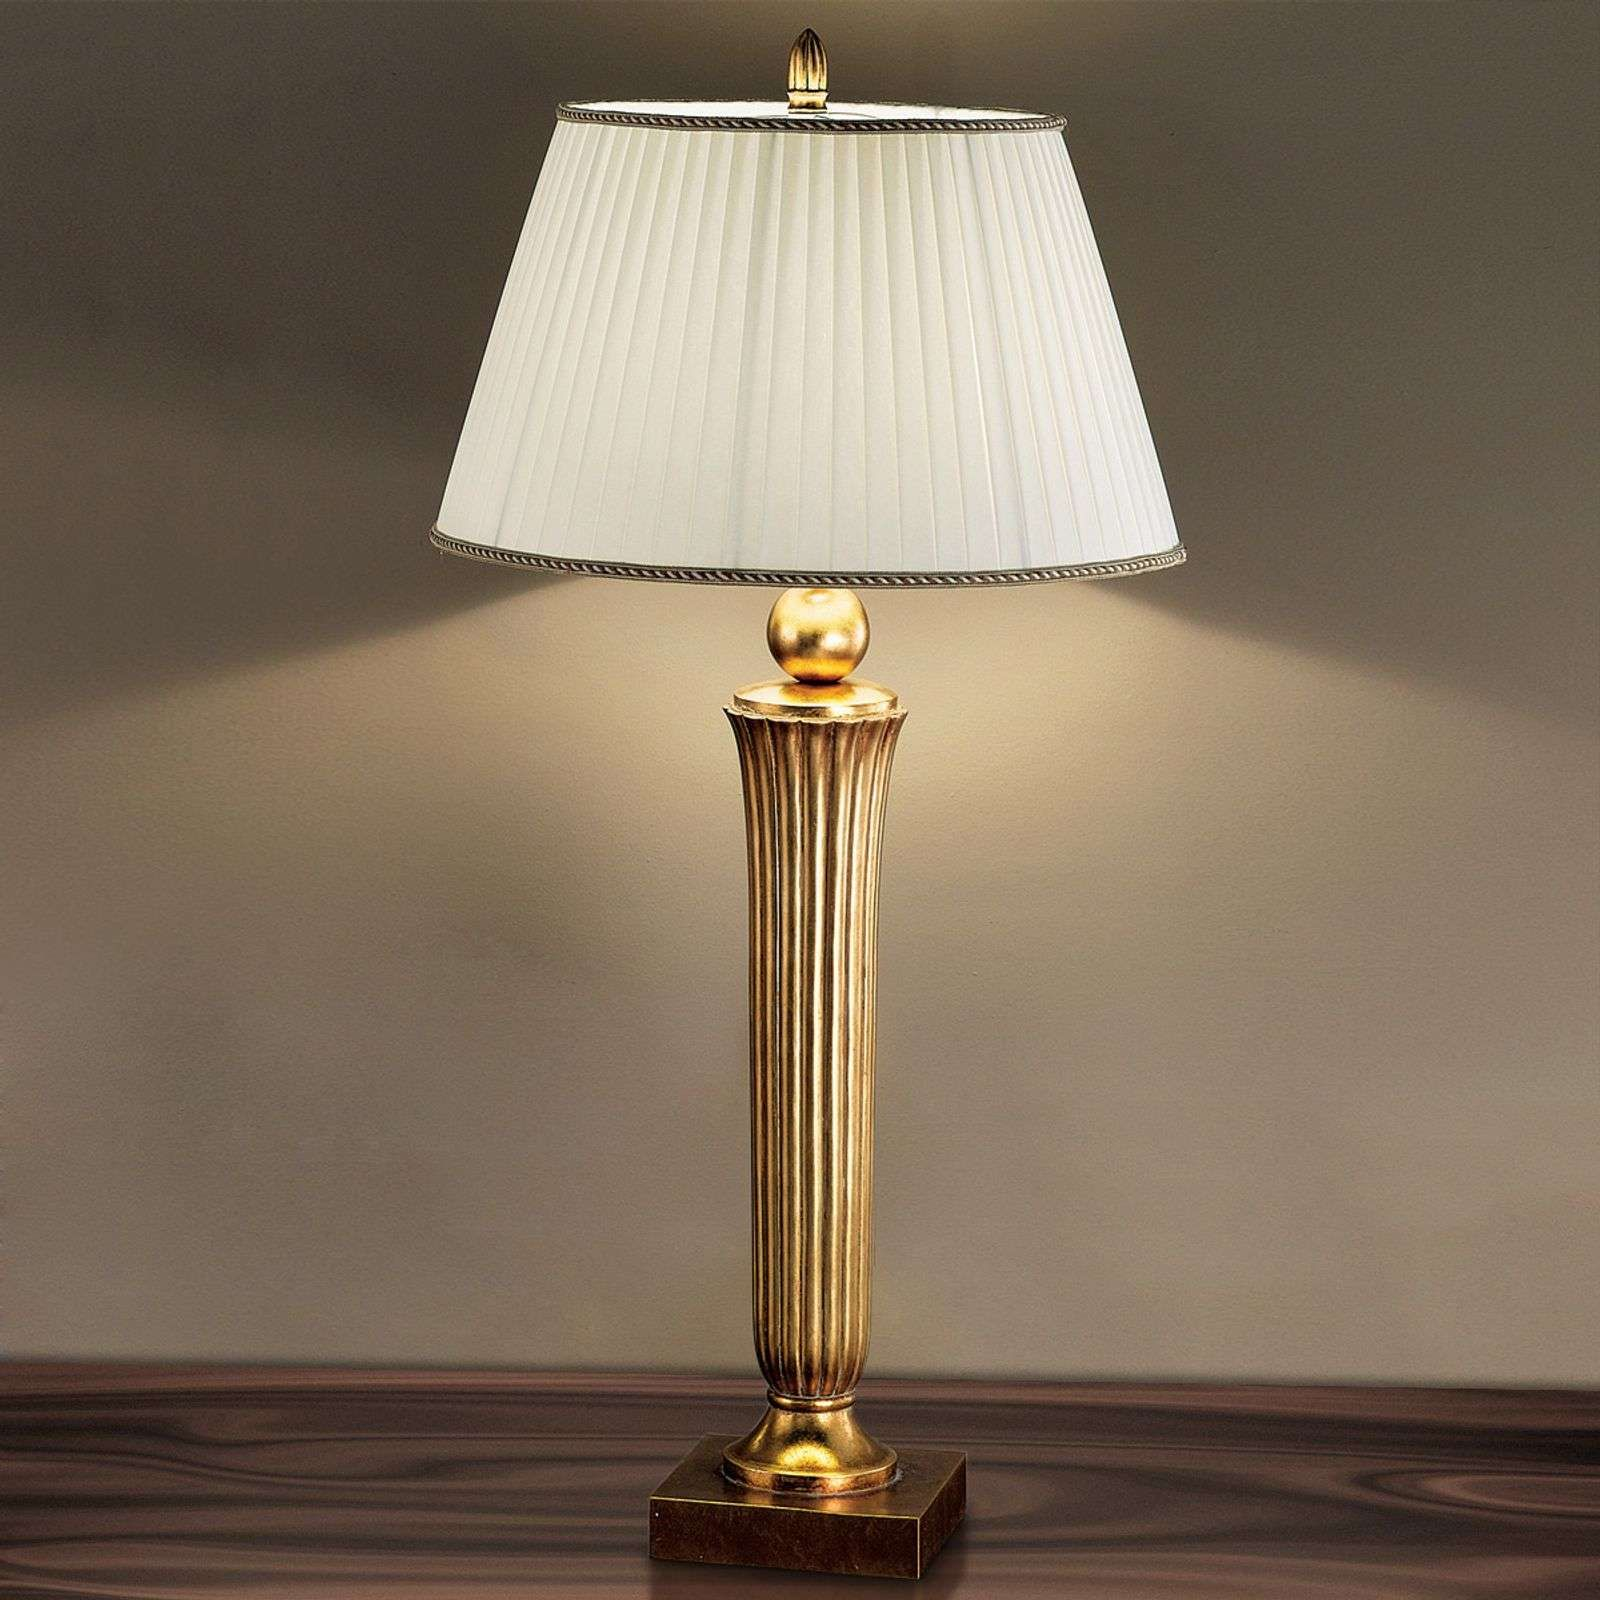 Prachtige vloerlamp JANNI in warme goudtint Laag plafond